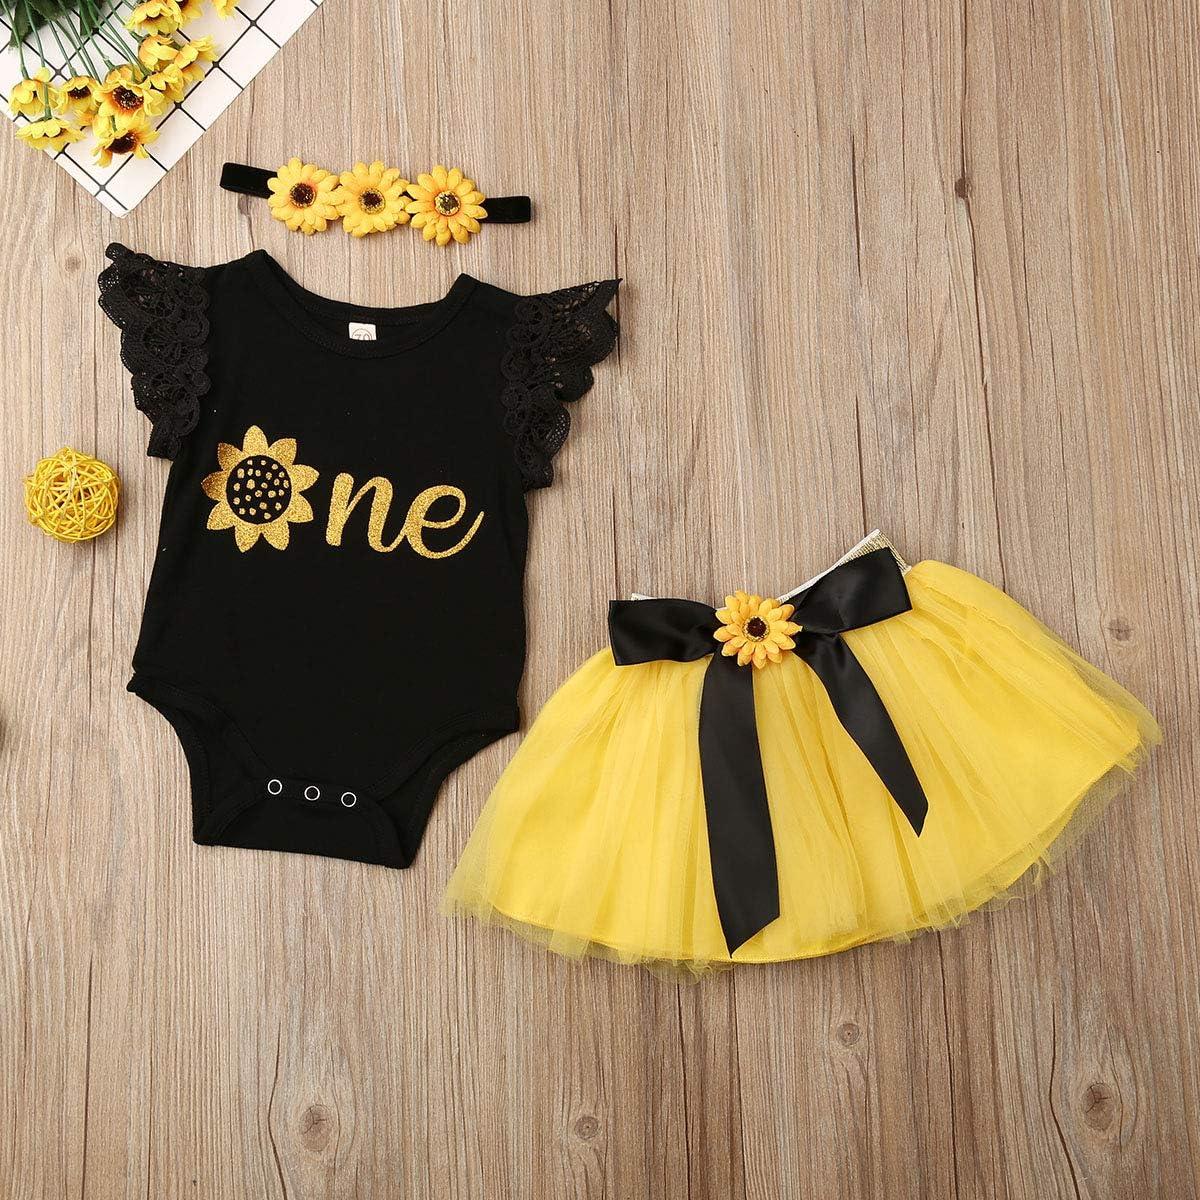 Newborn Infant Baby Girl Birthday Outfits One Romper Bodysuit Tops+Tutu Skirt Dress Clothing Sets